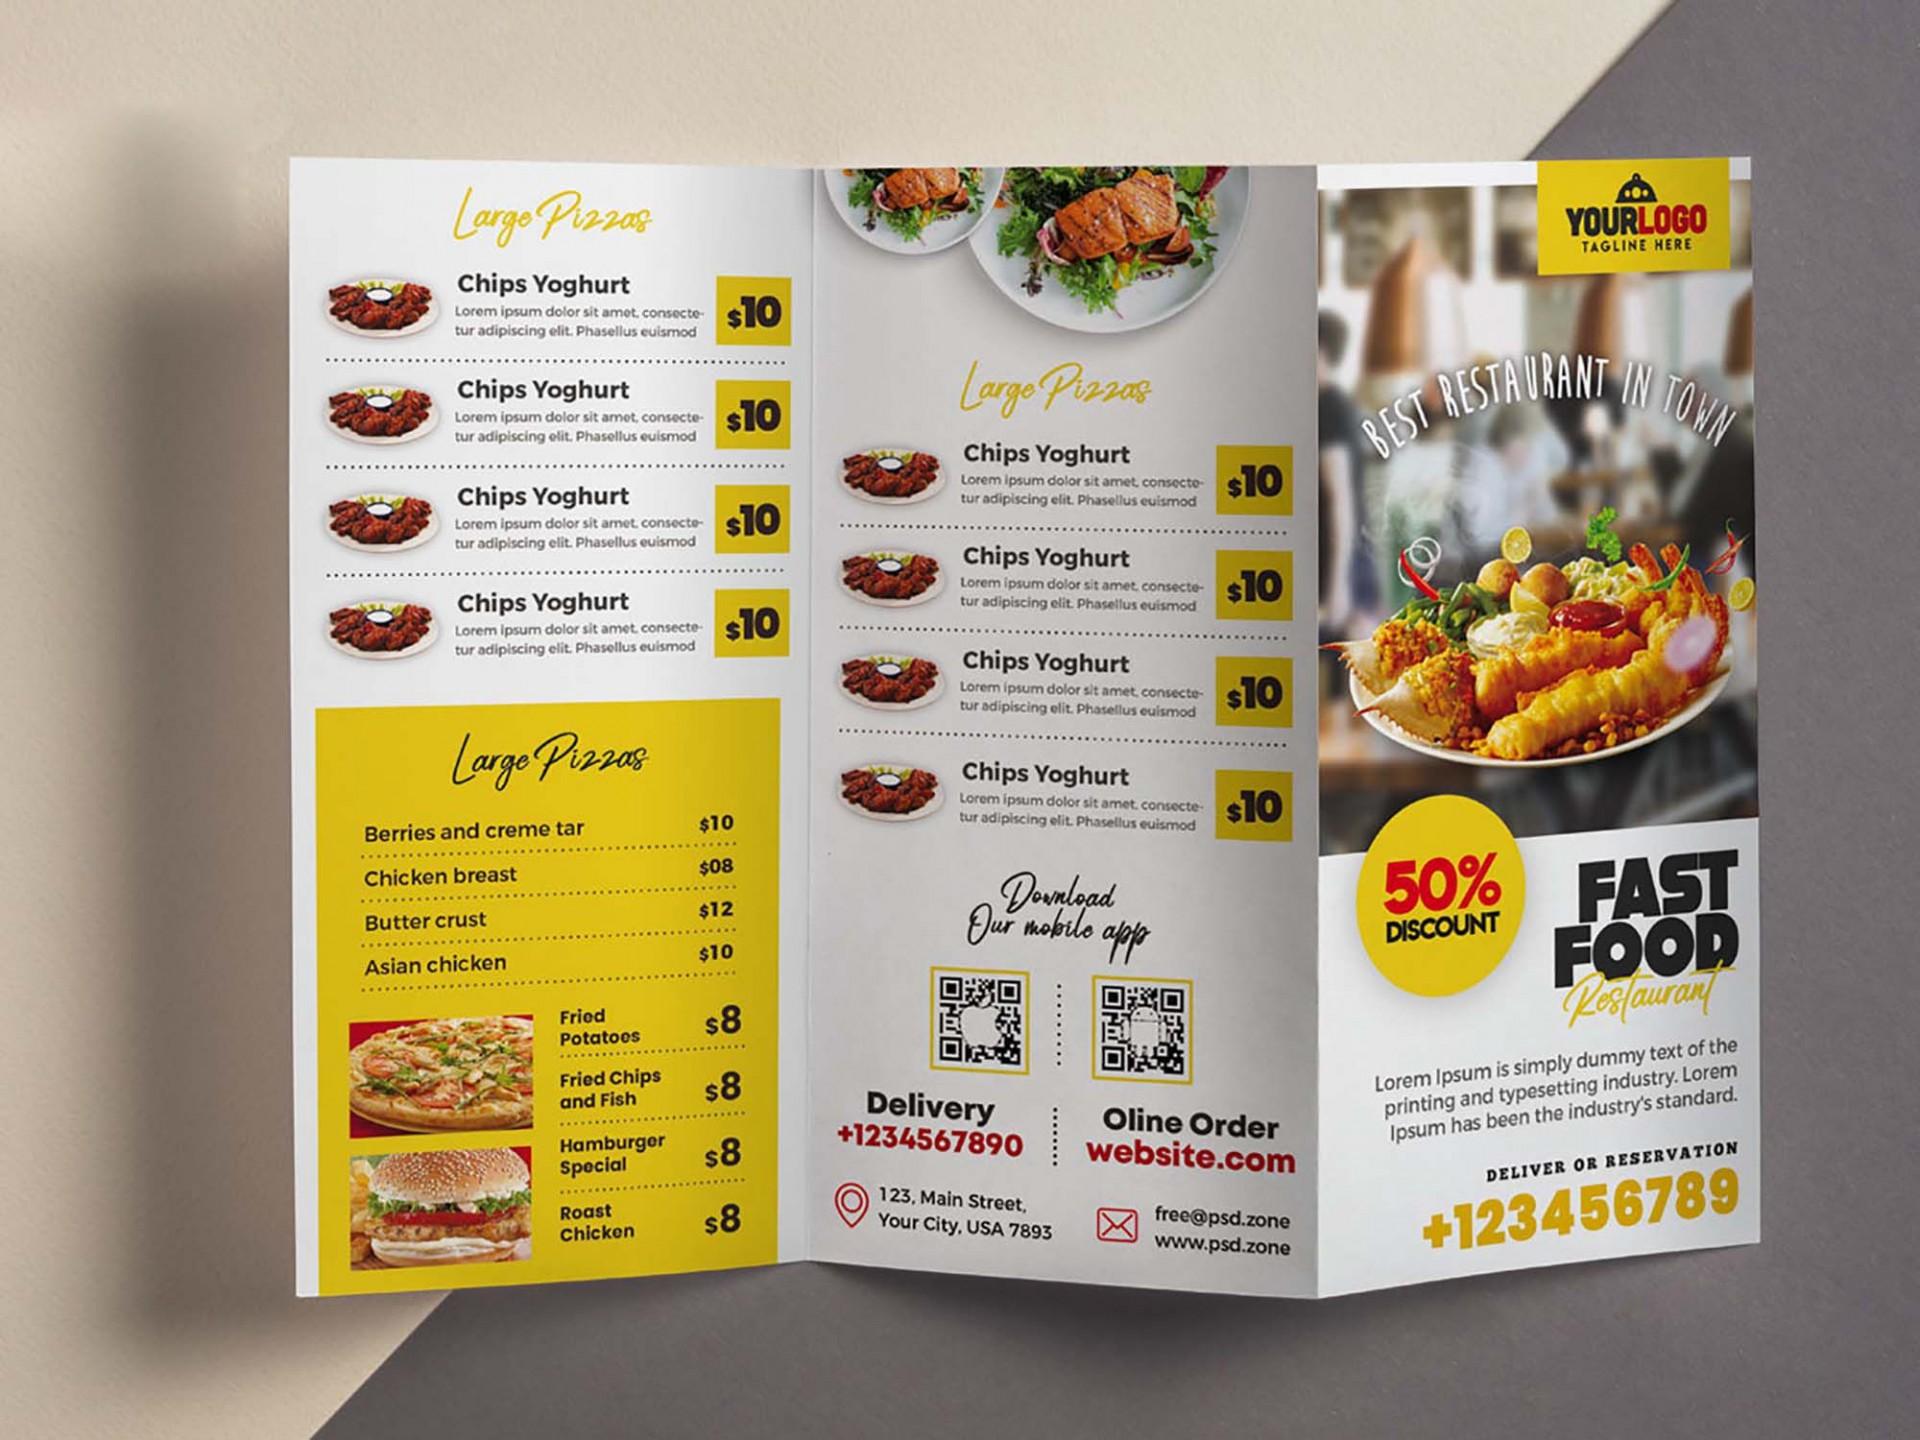 006 Imposing Tri Fold Menu Template Picture  Templates Restaurant Tri-fold Food Free Psd1920